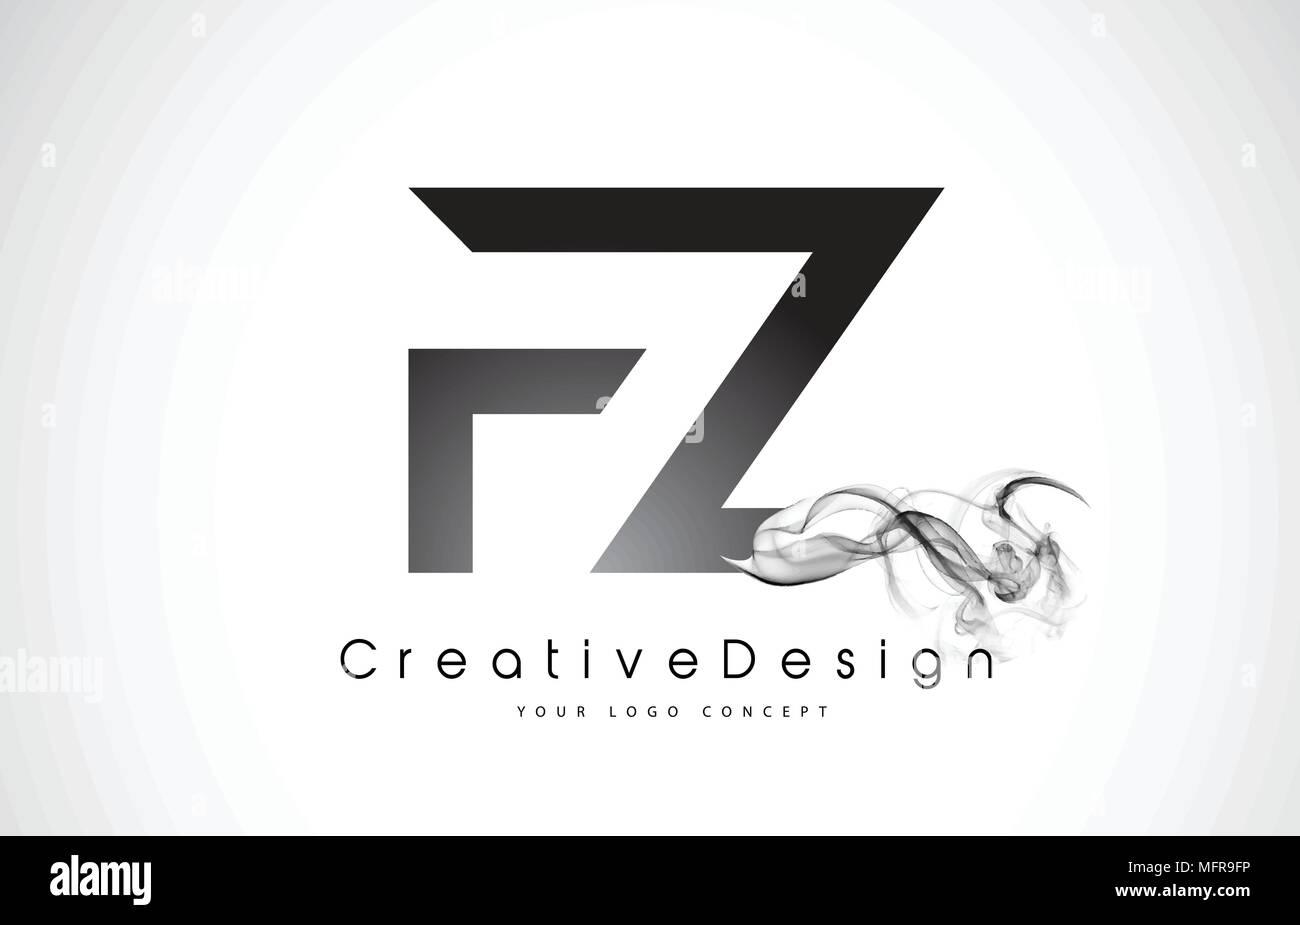 fz letter logo design with black smoke creative modern smoke letters vector icon logo illustration